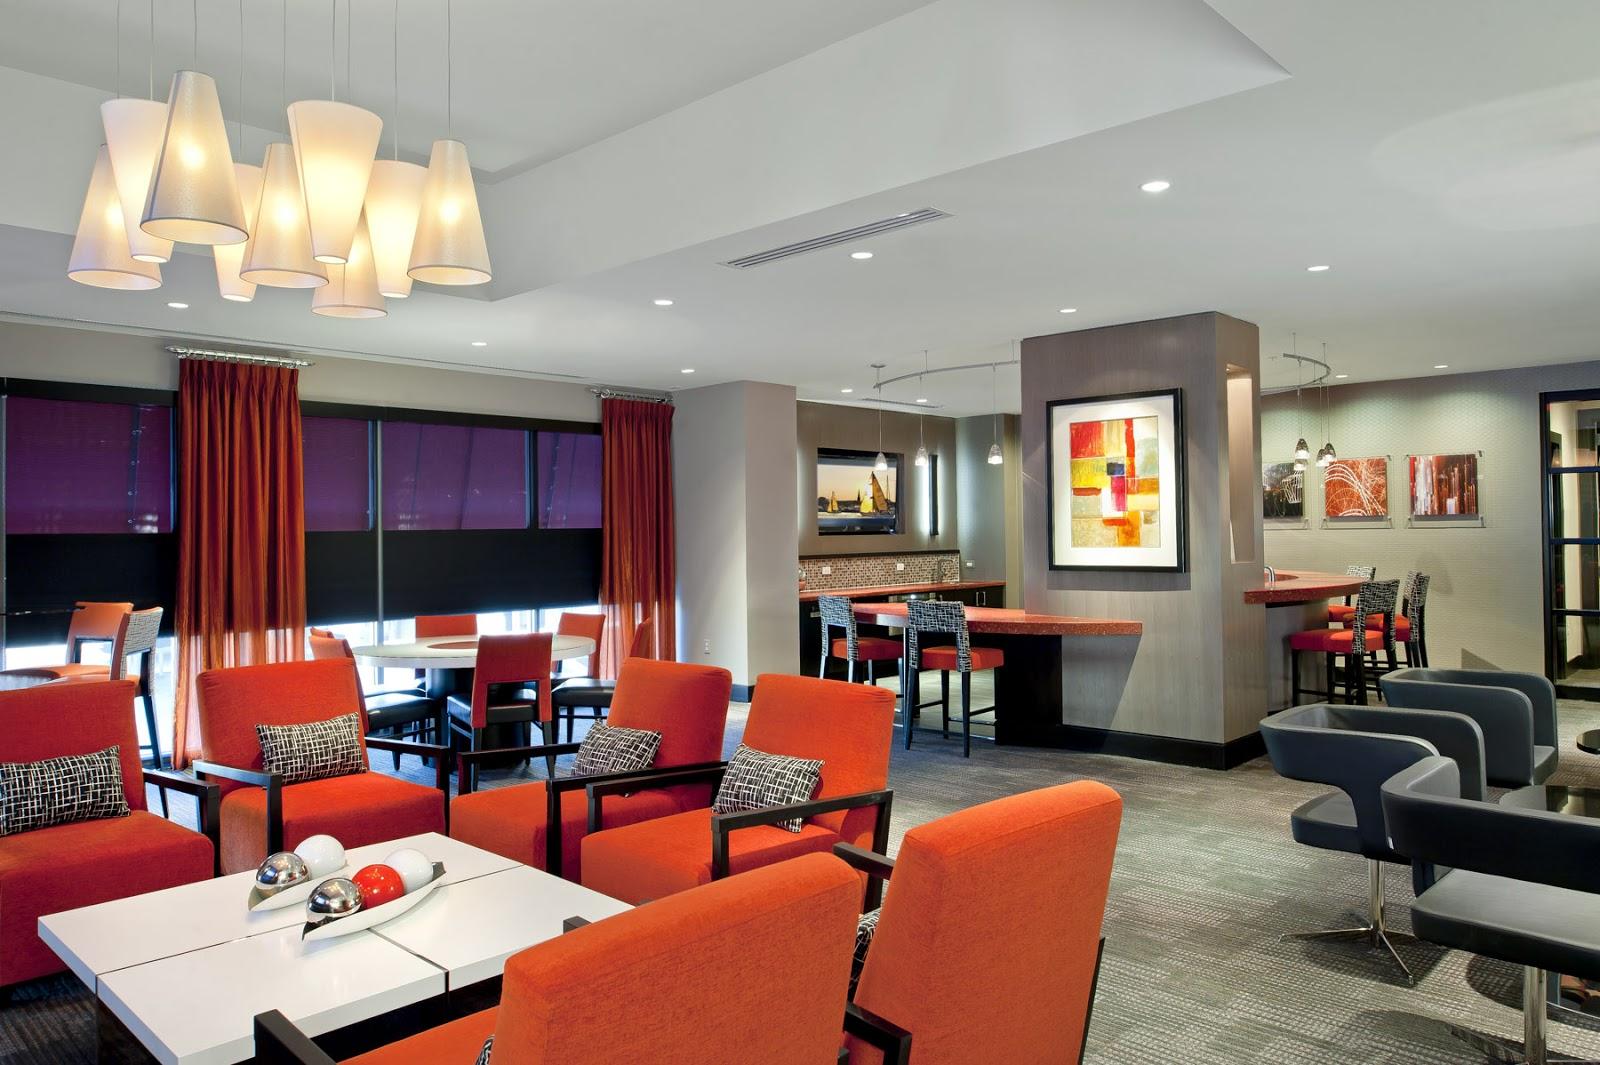 Salman Khan Home Interior Design Images   rbservis.com